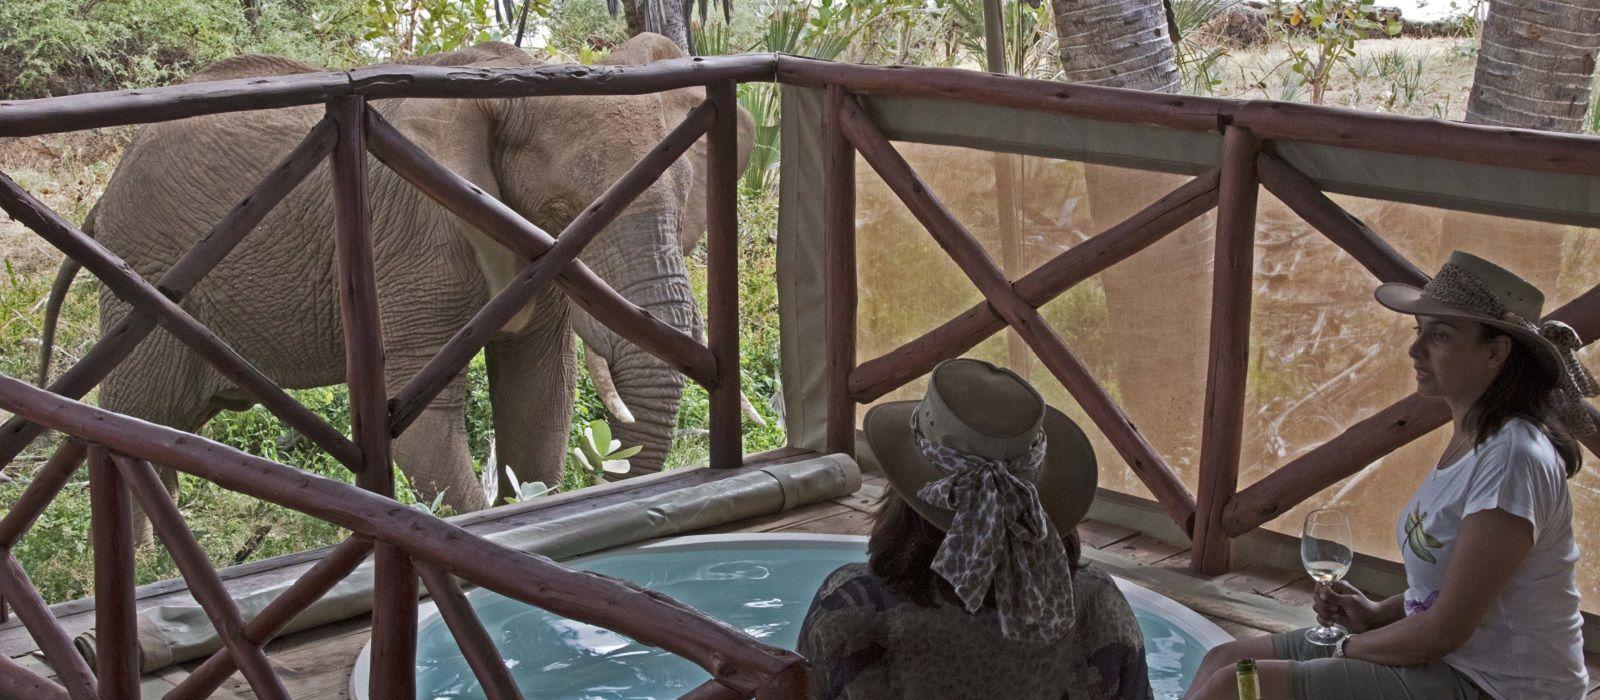 Atua Enkop Exklusiv: Kenia Safari und Strandurlaub Urlaub 6